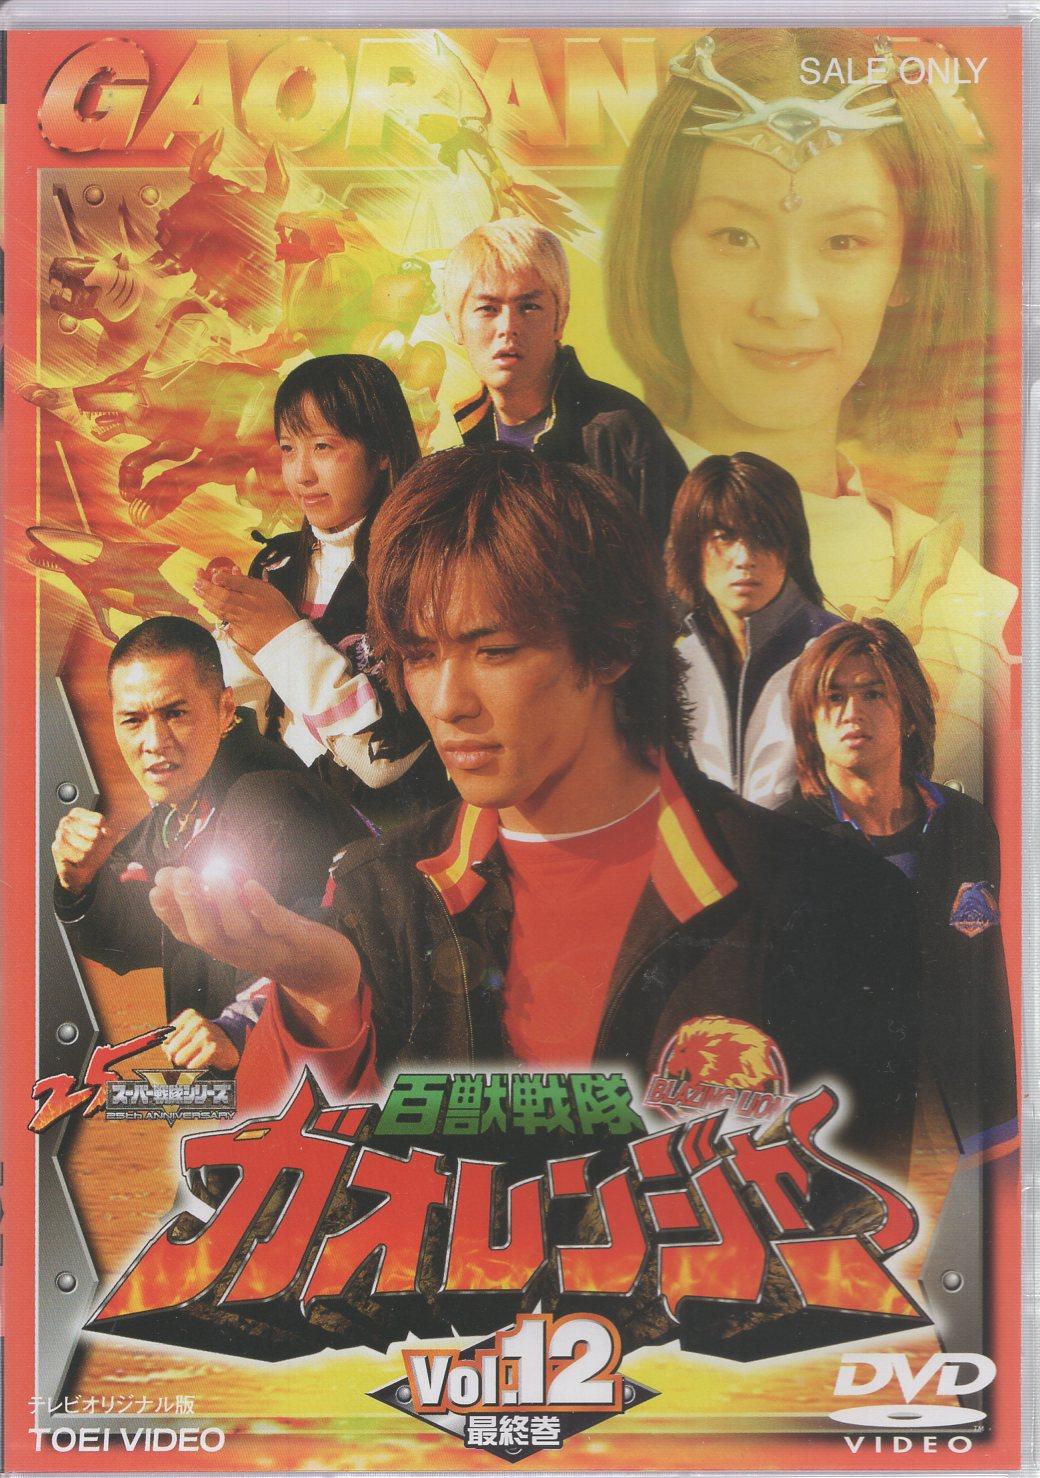 File:Gaoranger DVD Vol 12.jpg